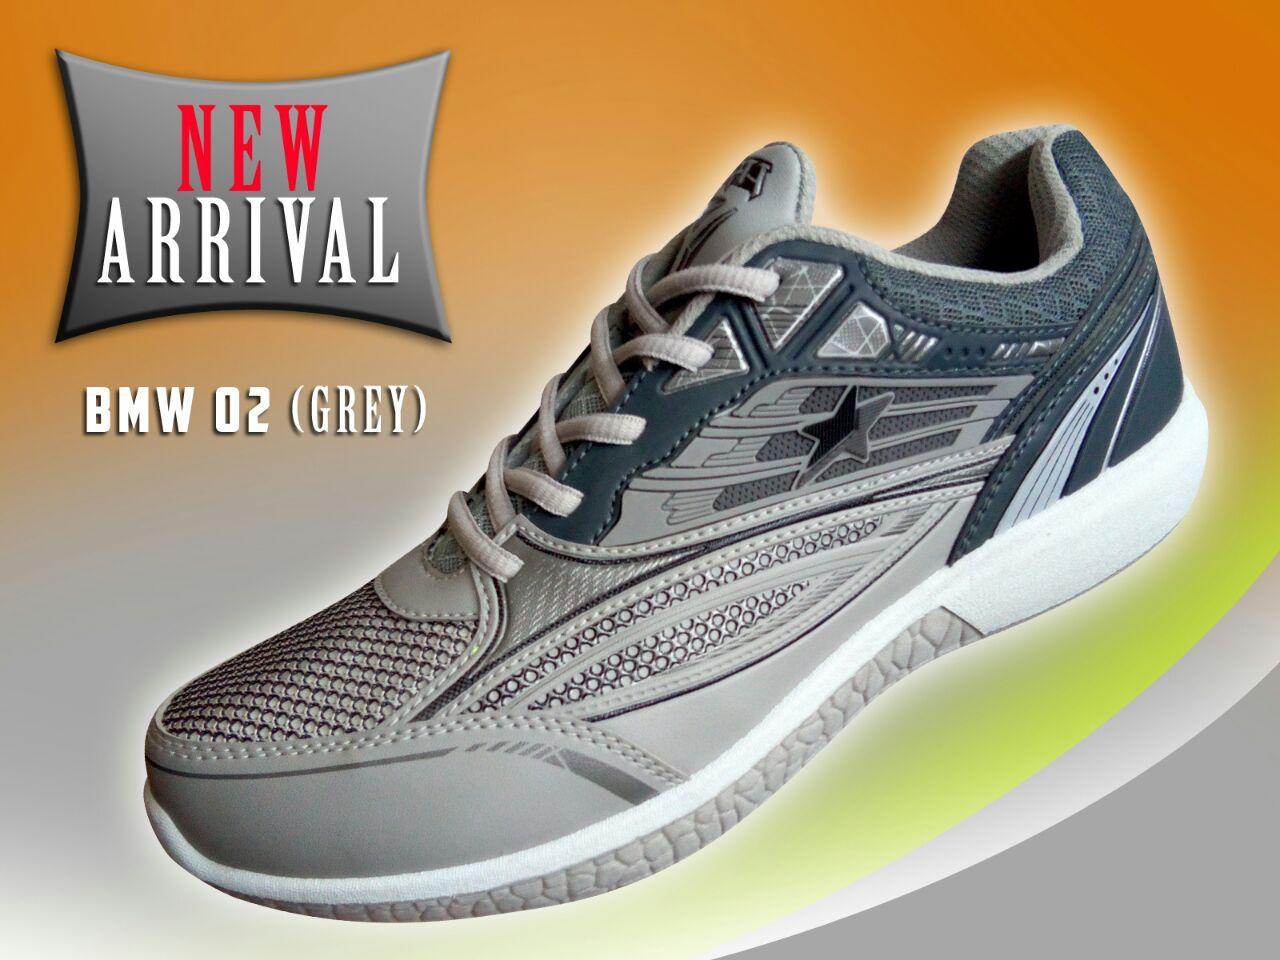 Amelia Olshop - Pro ATT Sepatu Sneaker Pria / Sepatu Pria / Sepatu Olahraga / Sepatu Sport / Sepatu Murah / Sepatu High Quality New Arrival - BMW 02 Abu-abu